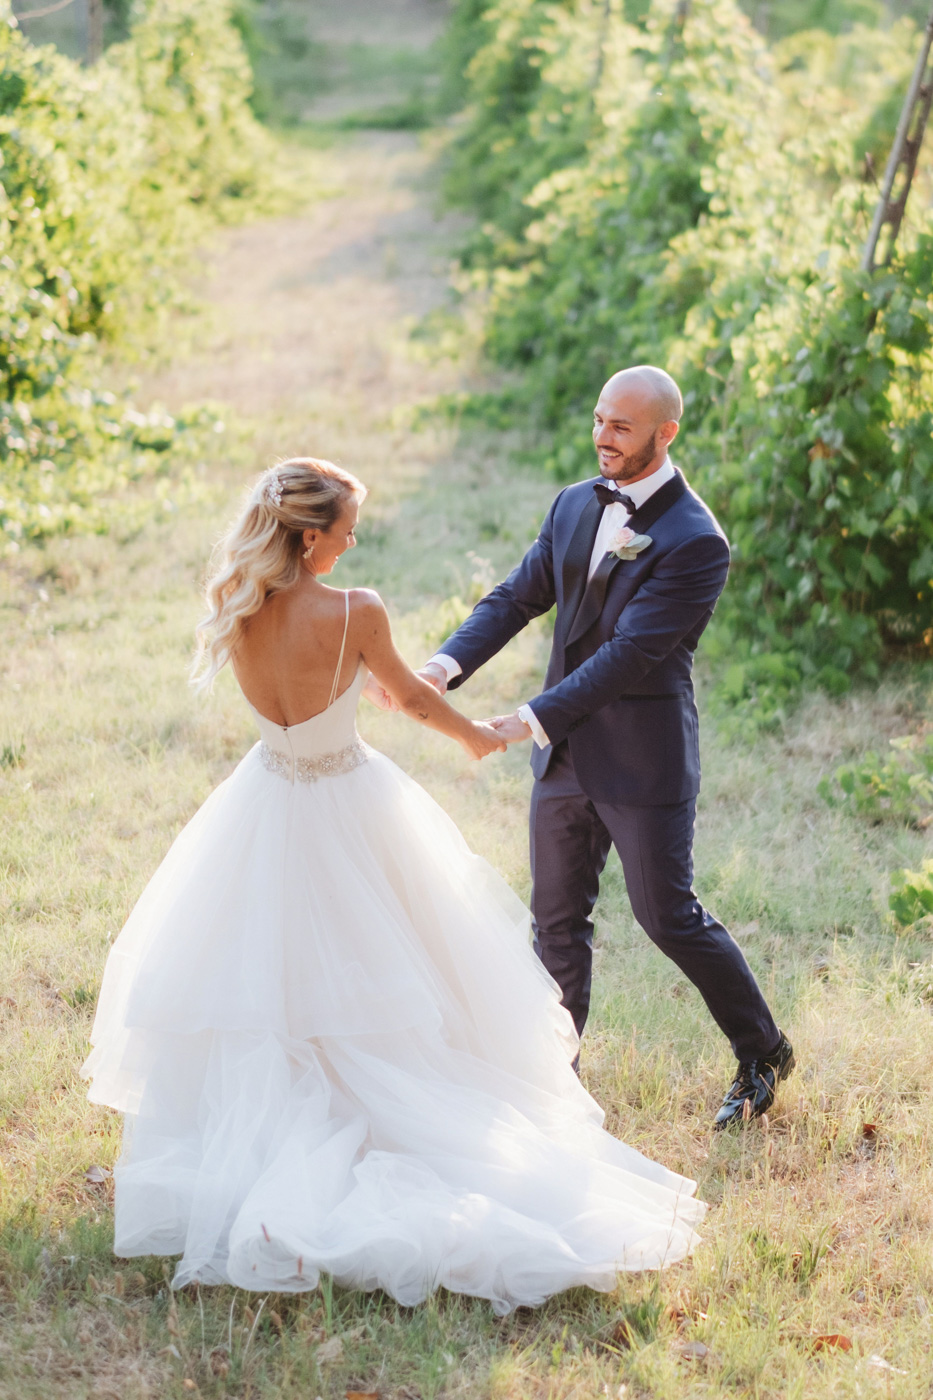 Matrimoni all'italiana wedding photographer italy-120.jpg